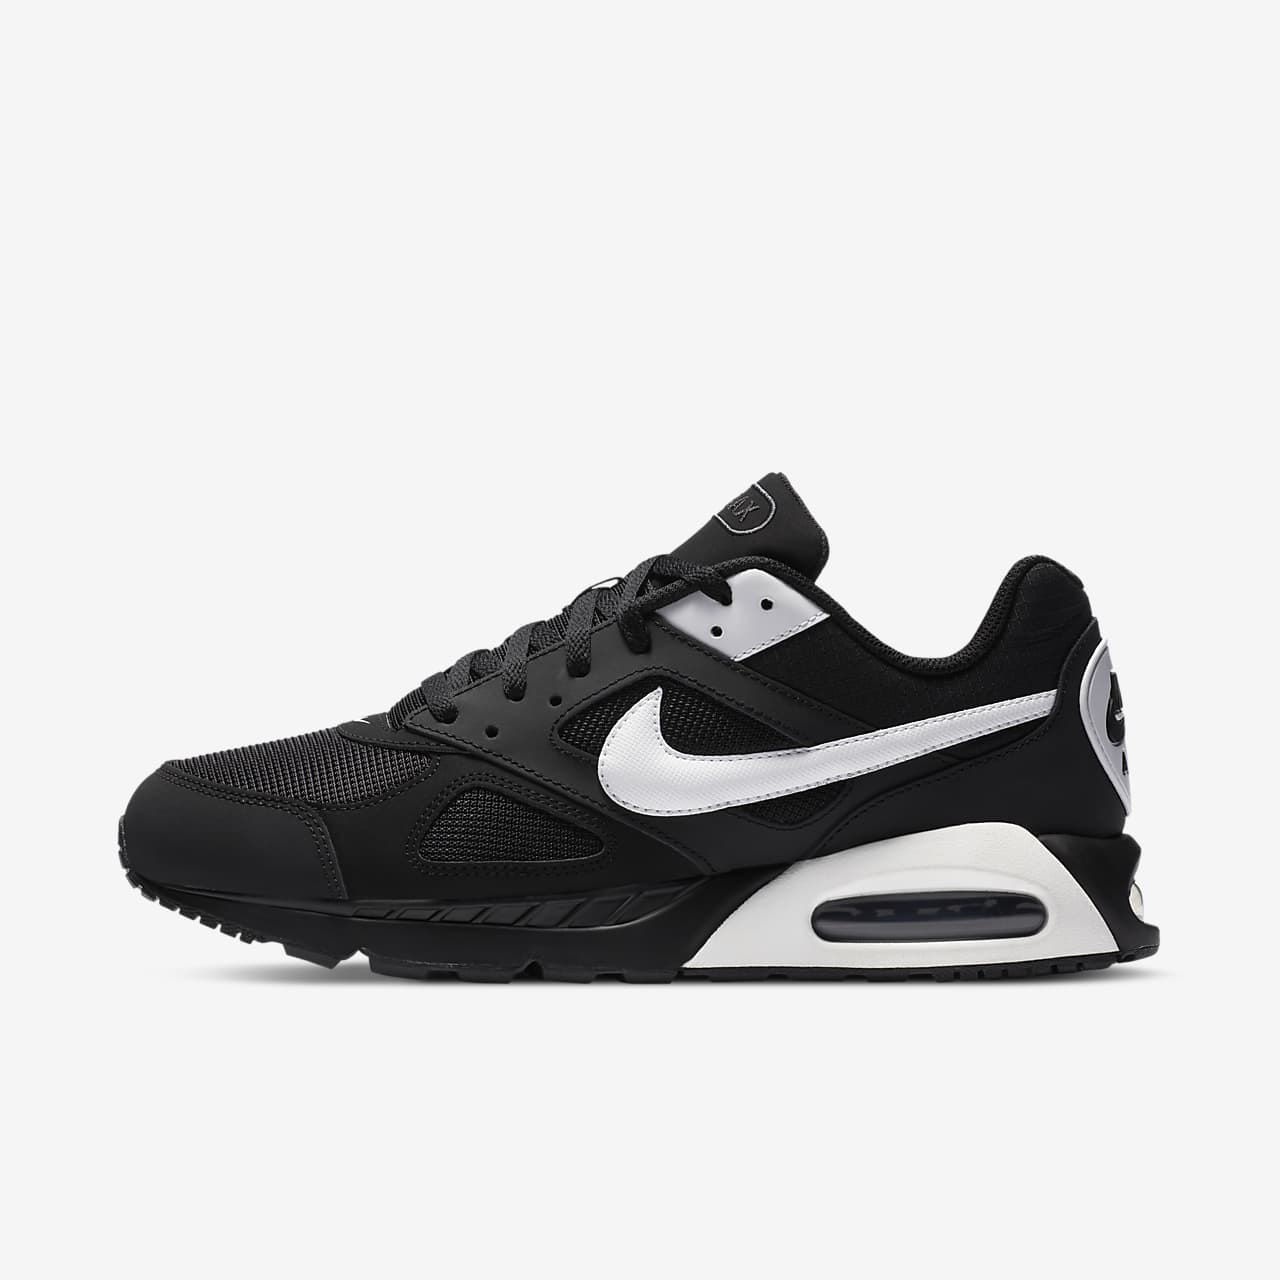 Rare Mens Shoes Nike Air Max 87 White Black